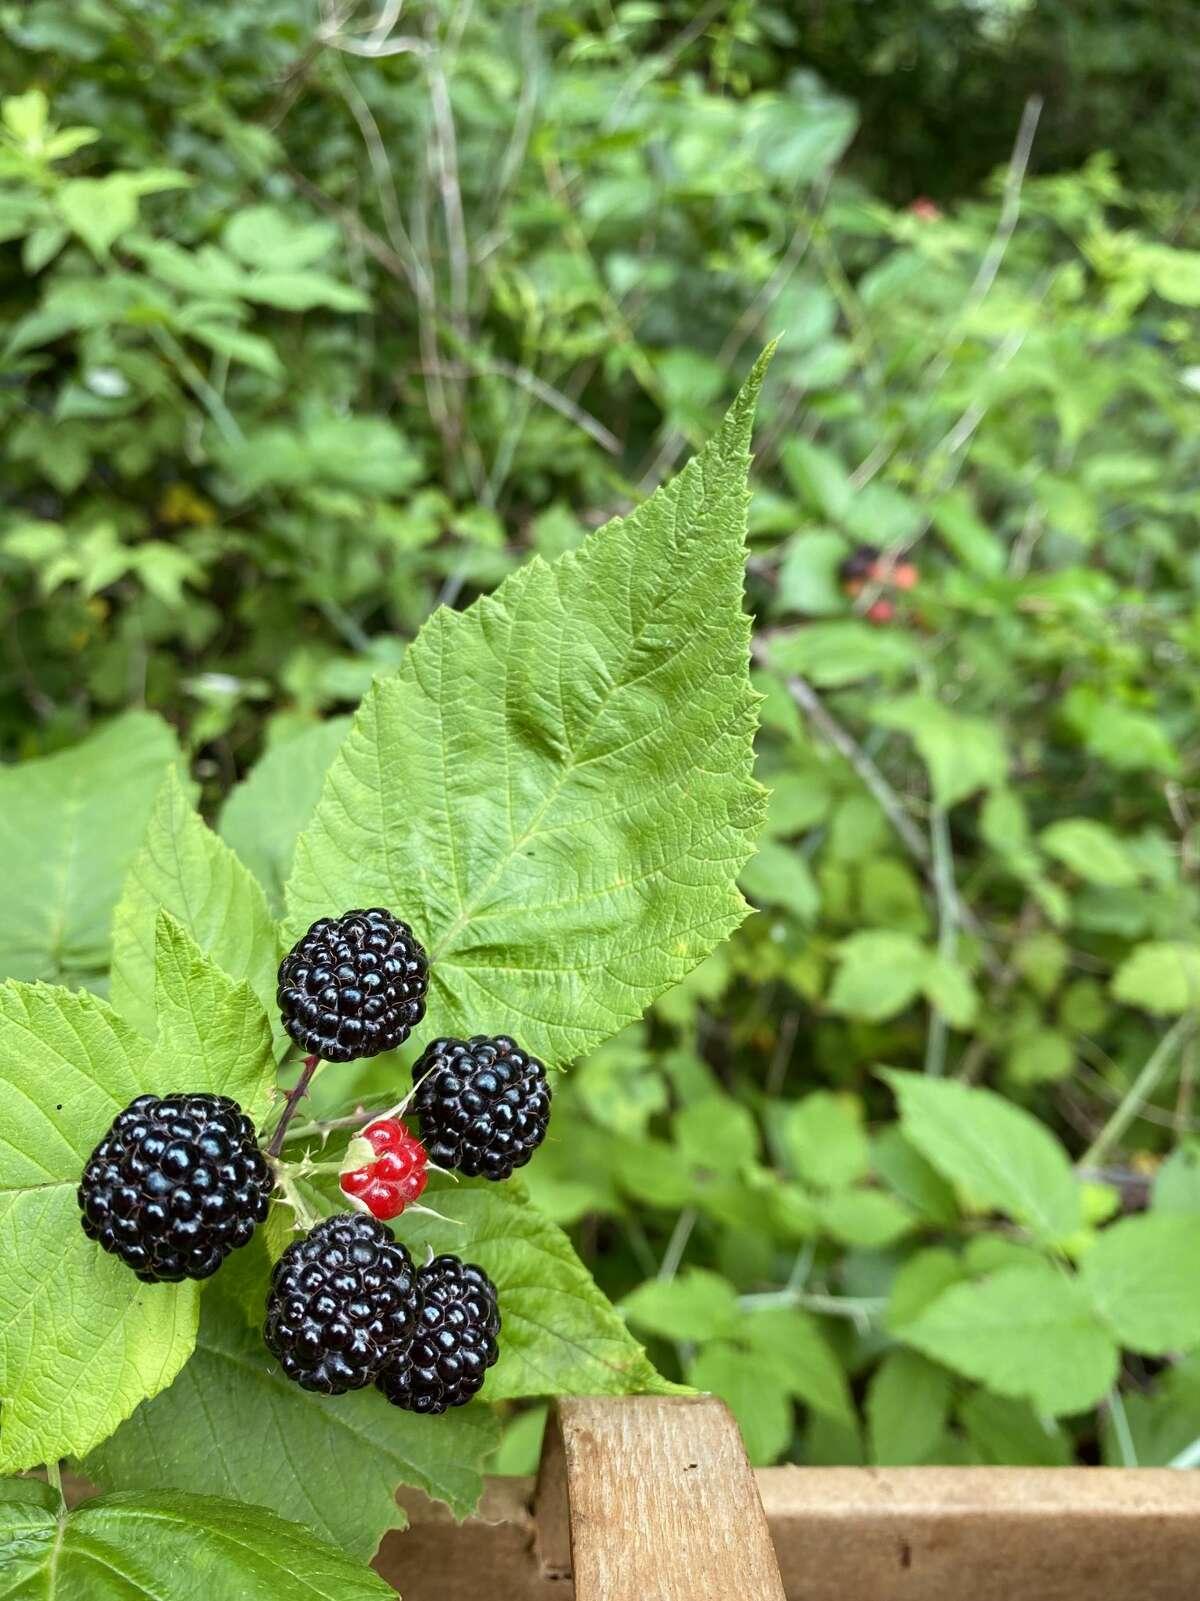 Wild blackberries in Stephanie Gravalese's backyard.